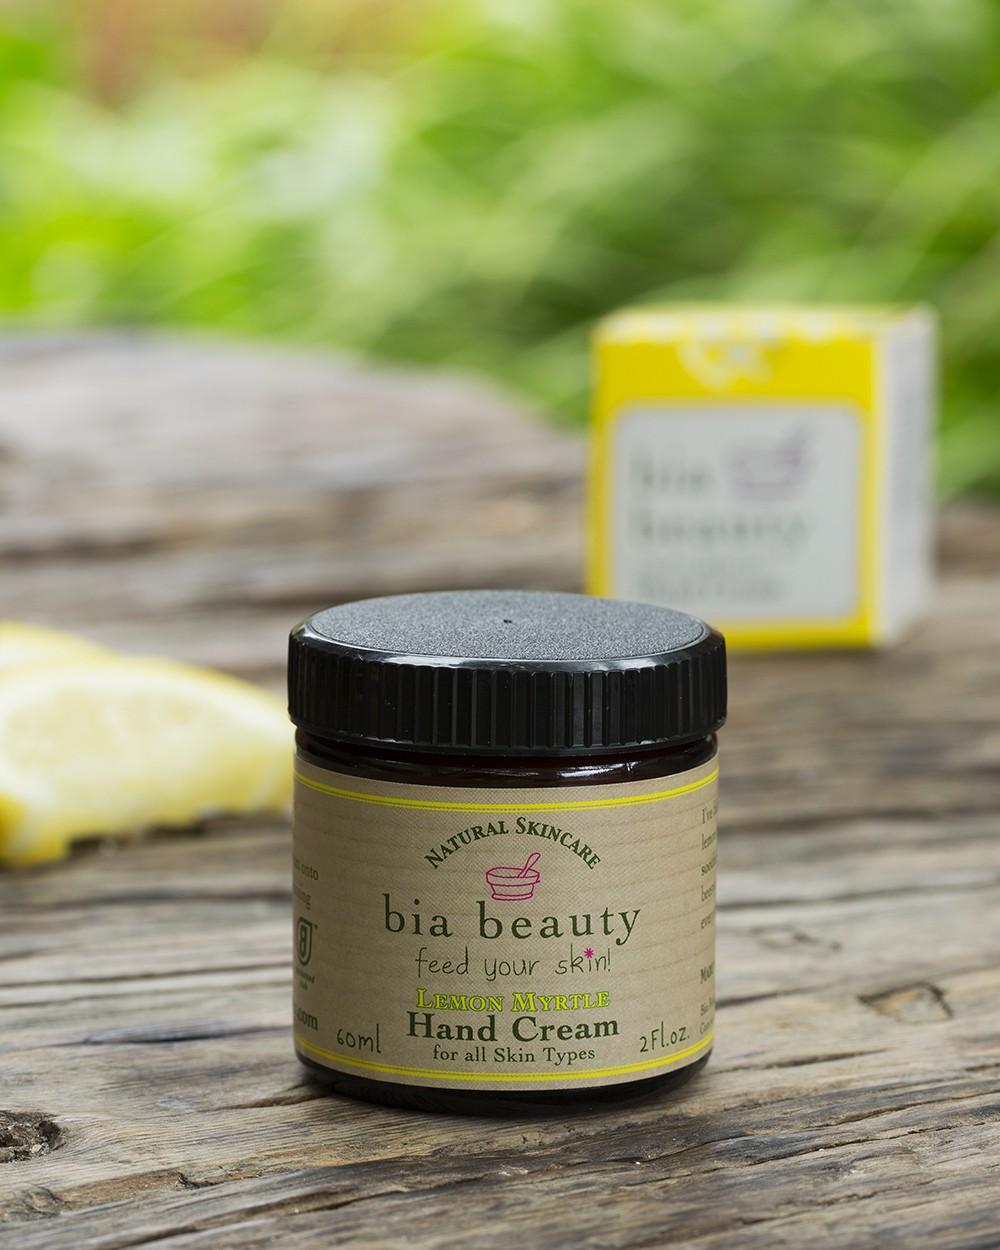 Bia Beauty Lemon Myrtle Hand Lotion